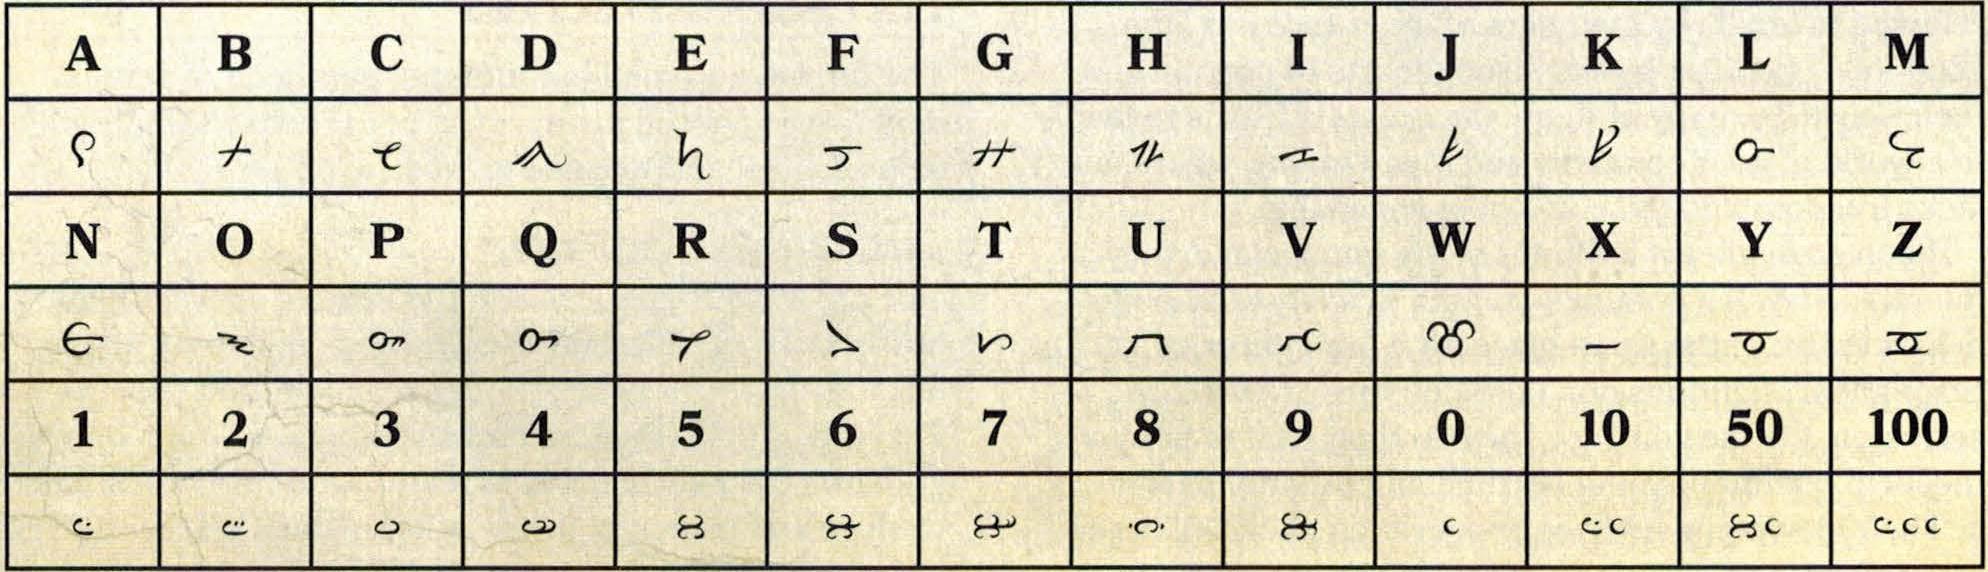 Category:Languages using Espruar | Forgotten Realms Wiki | FANDOM